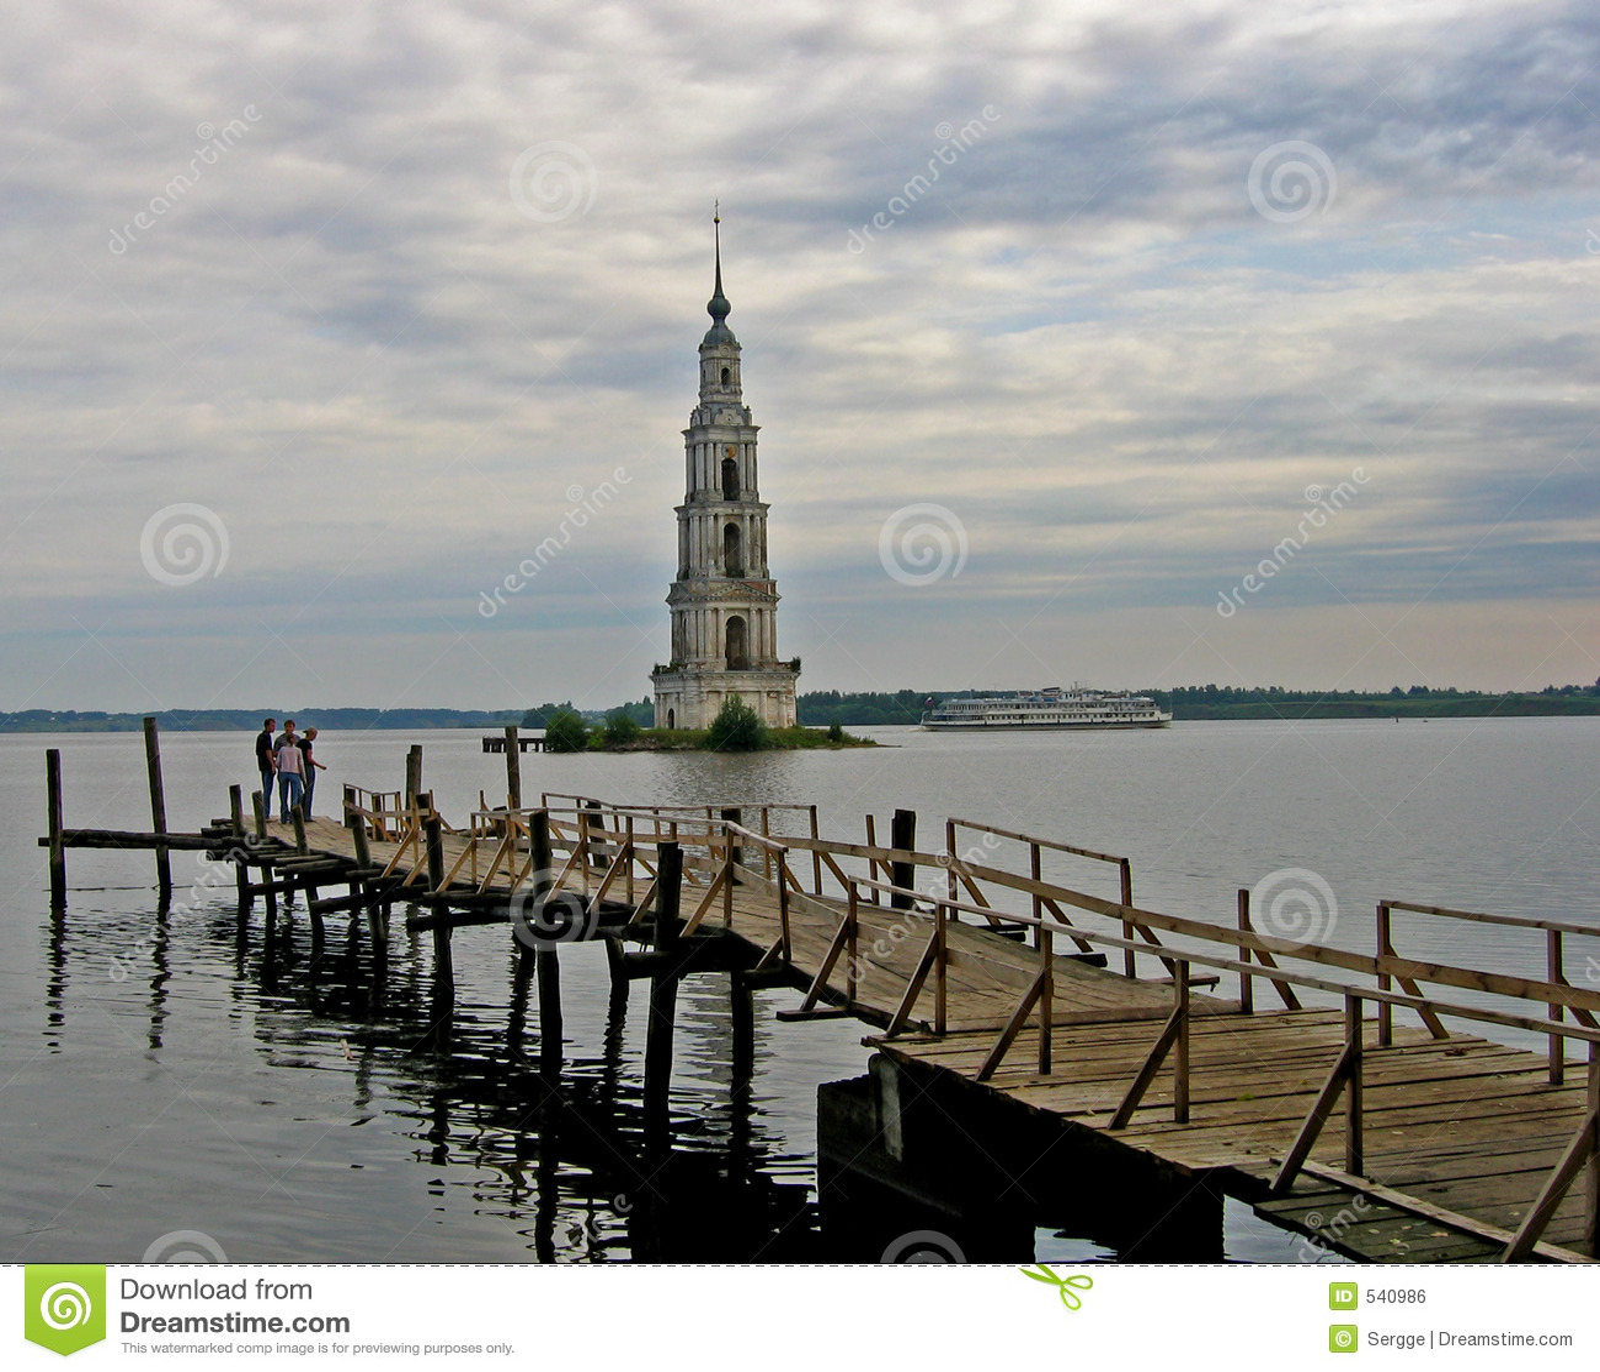 Download 响铃淹没了kalyasin俄国塔 库存照片. 图片 包括有 云彩, 淹没, 人们, 伏尔加河, 俄国, 响铃 - 540986